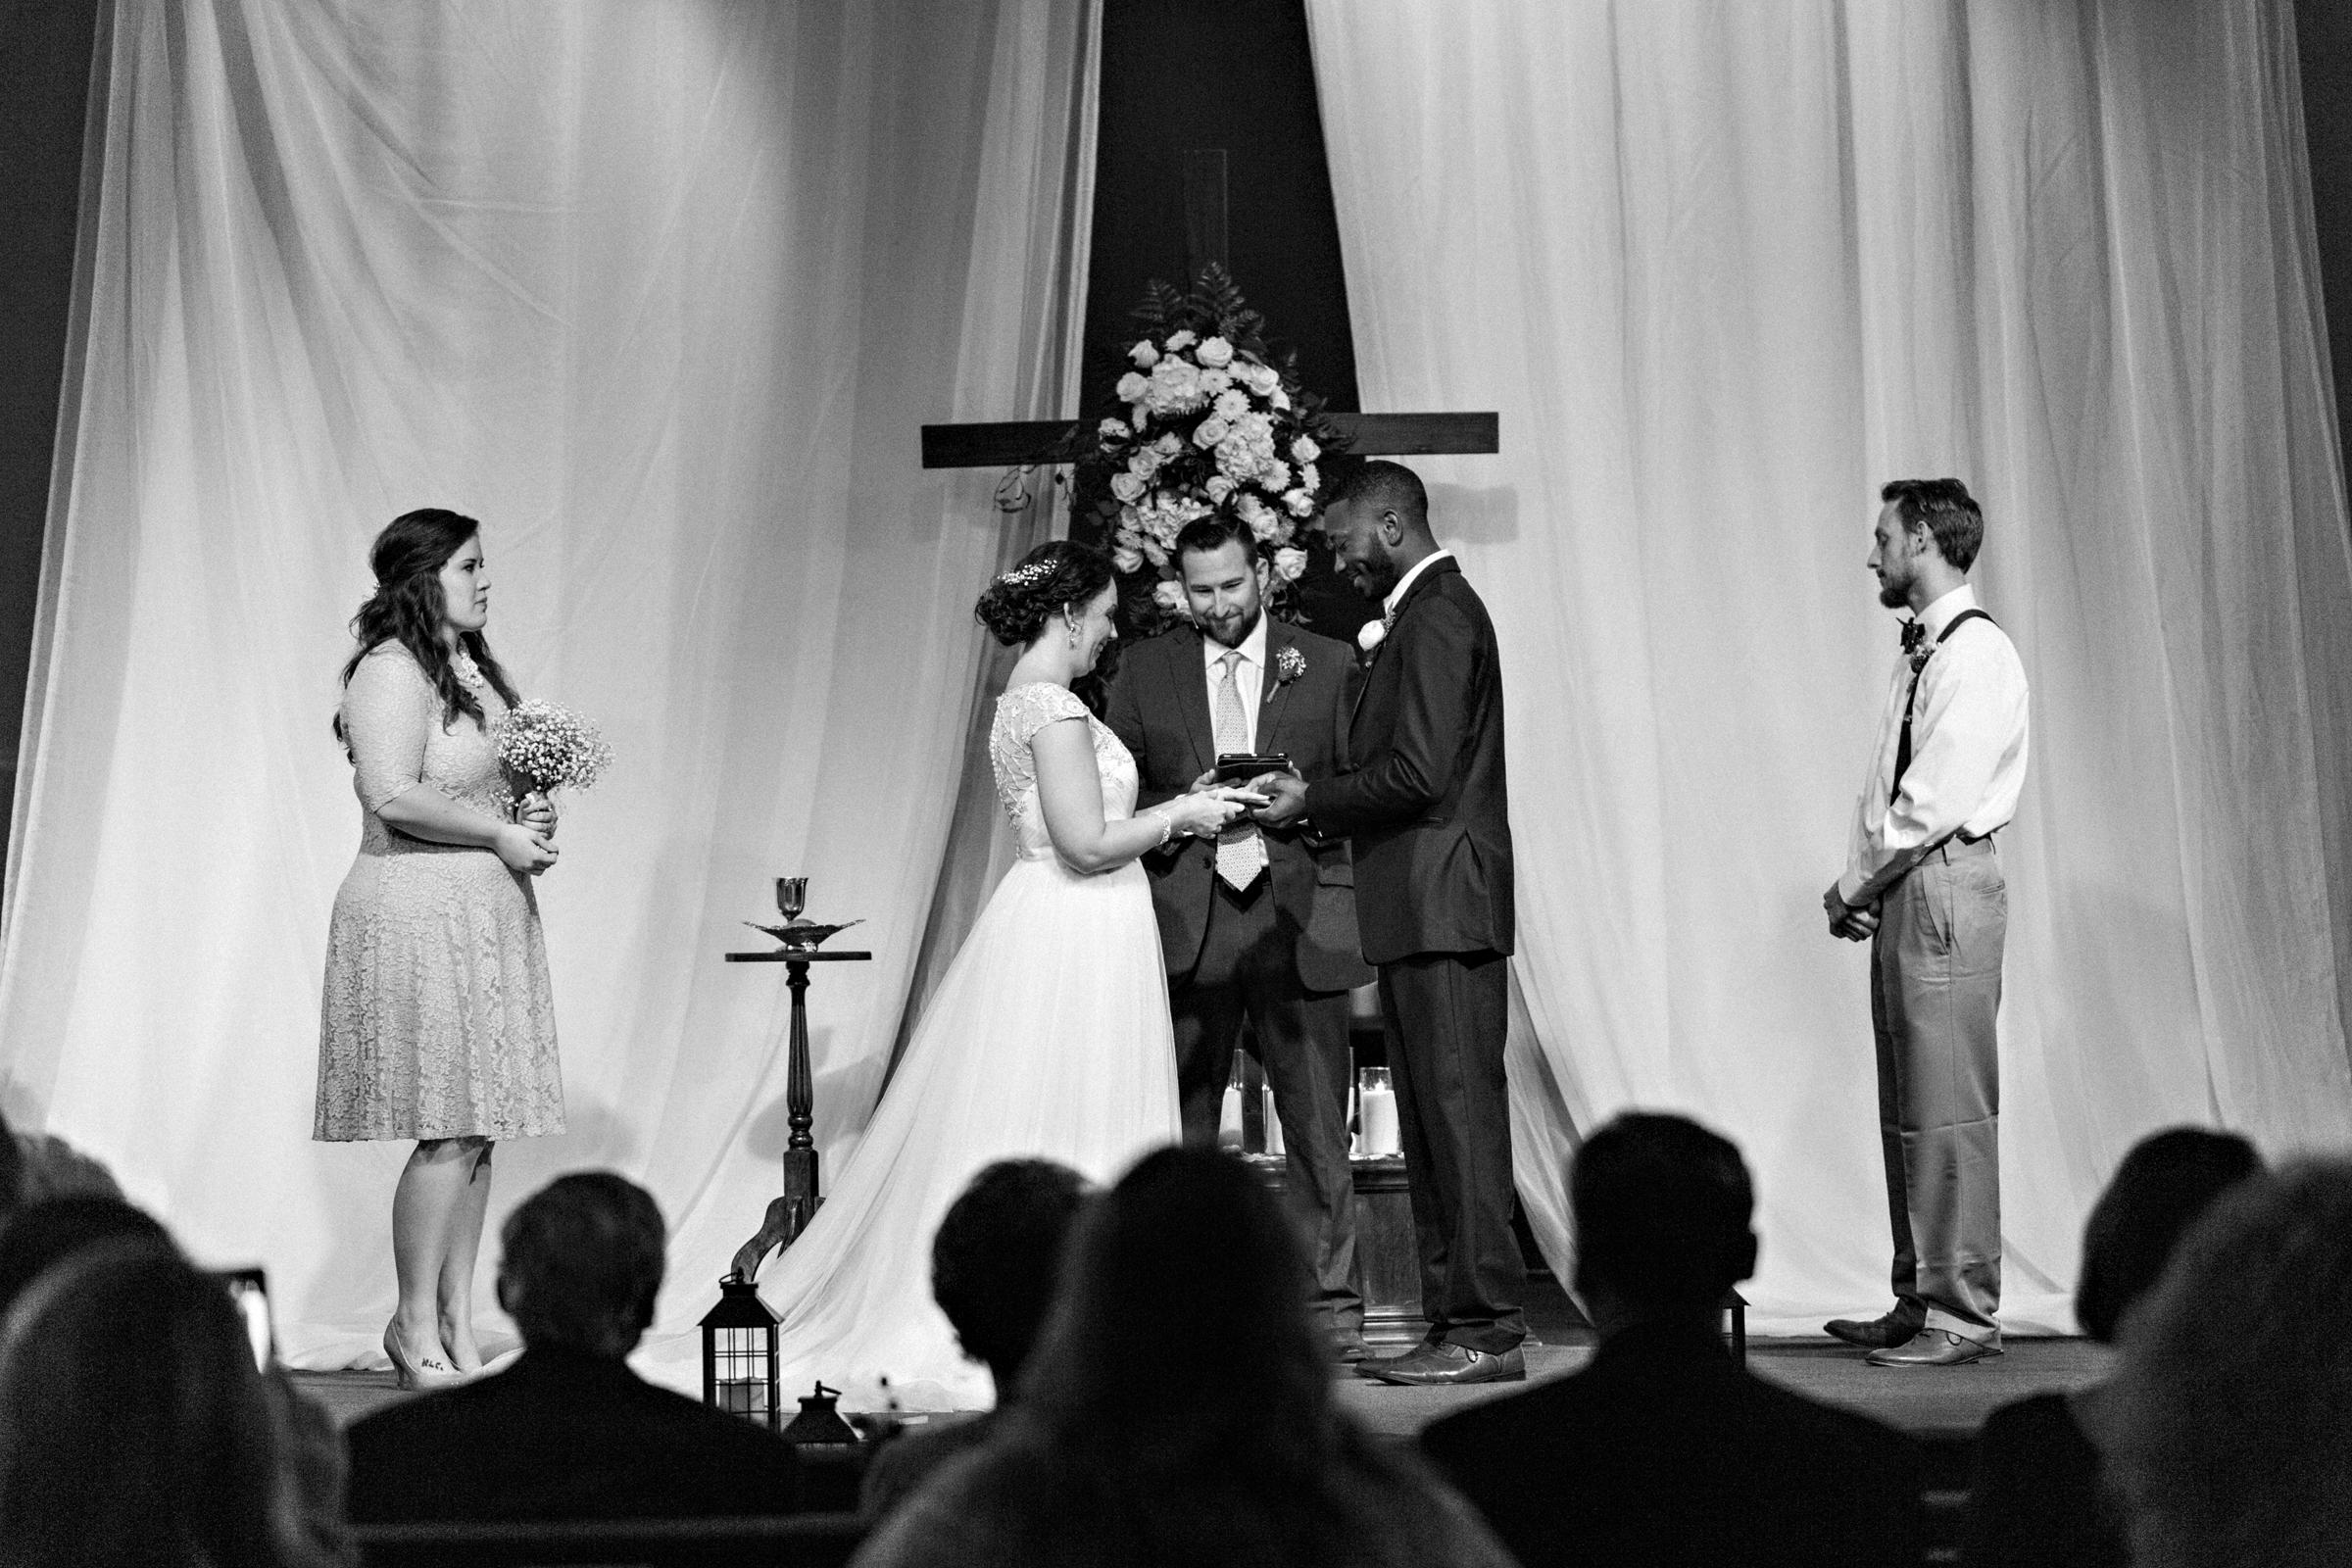 Alabama-Wedding-Photography-Nick-Drollette-Cory-Laura-147.jpg